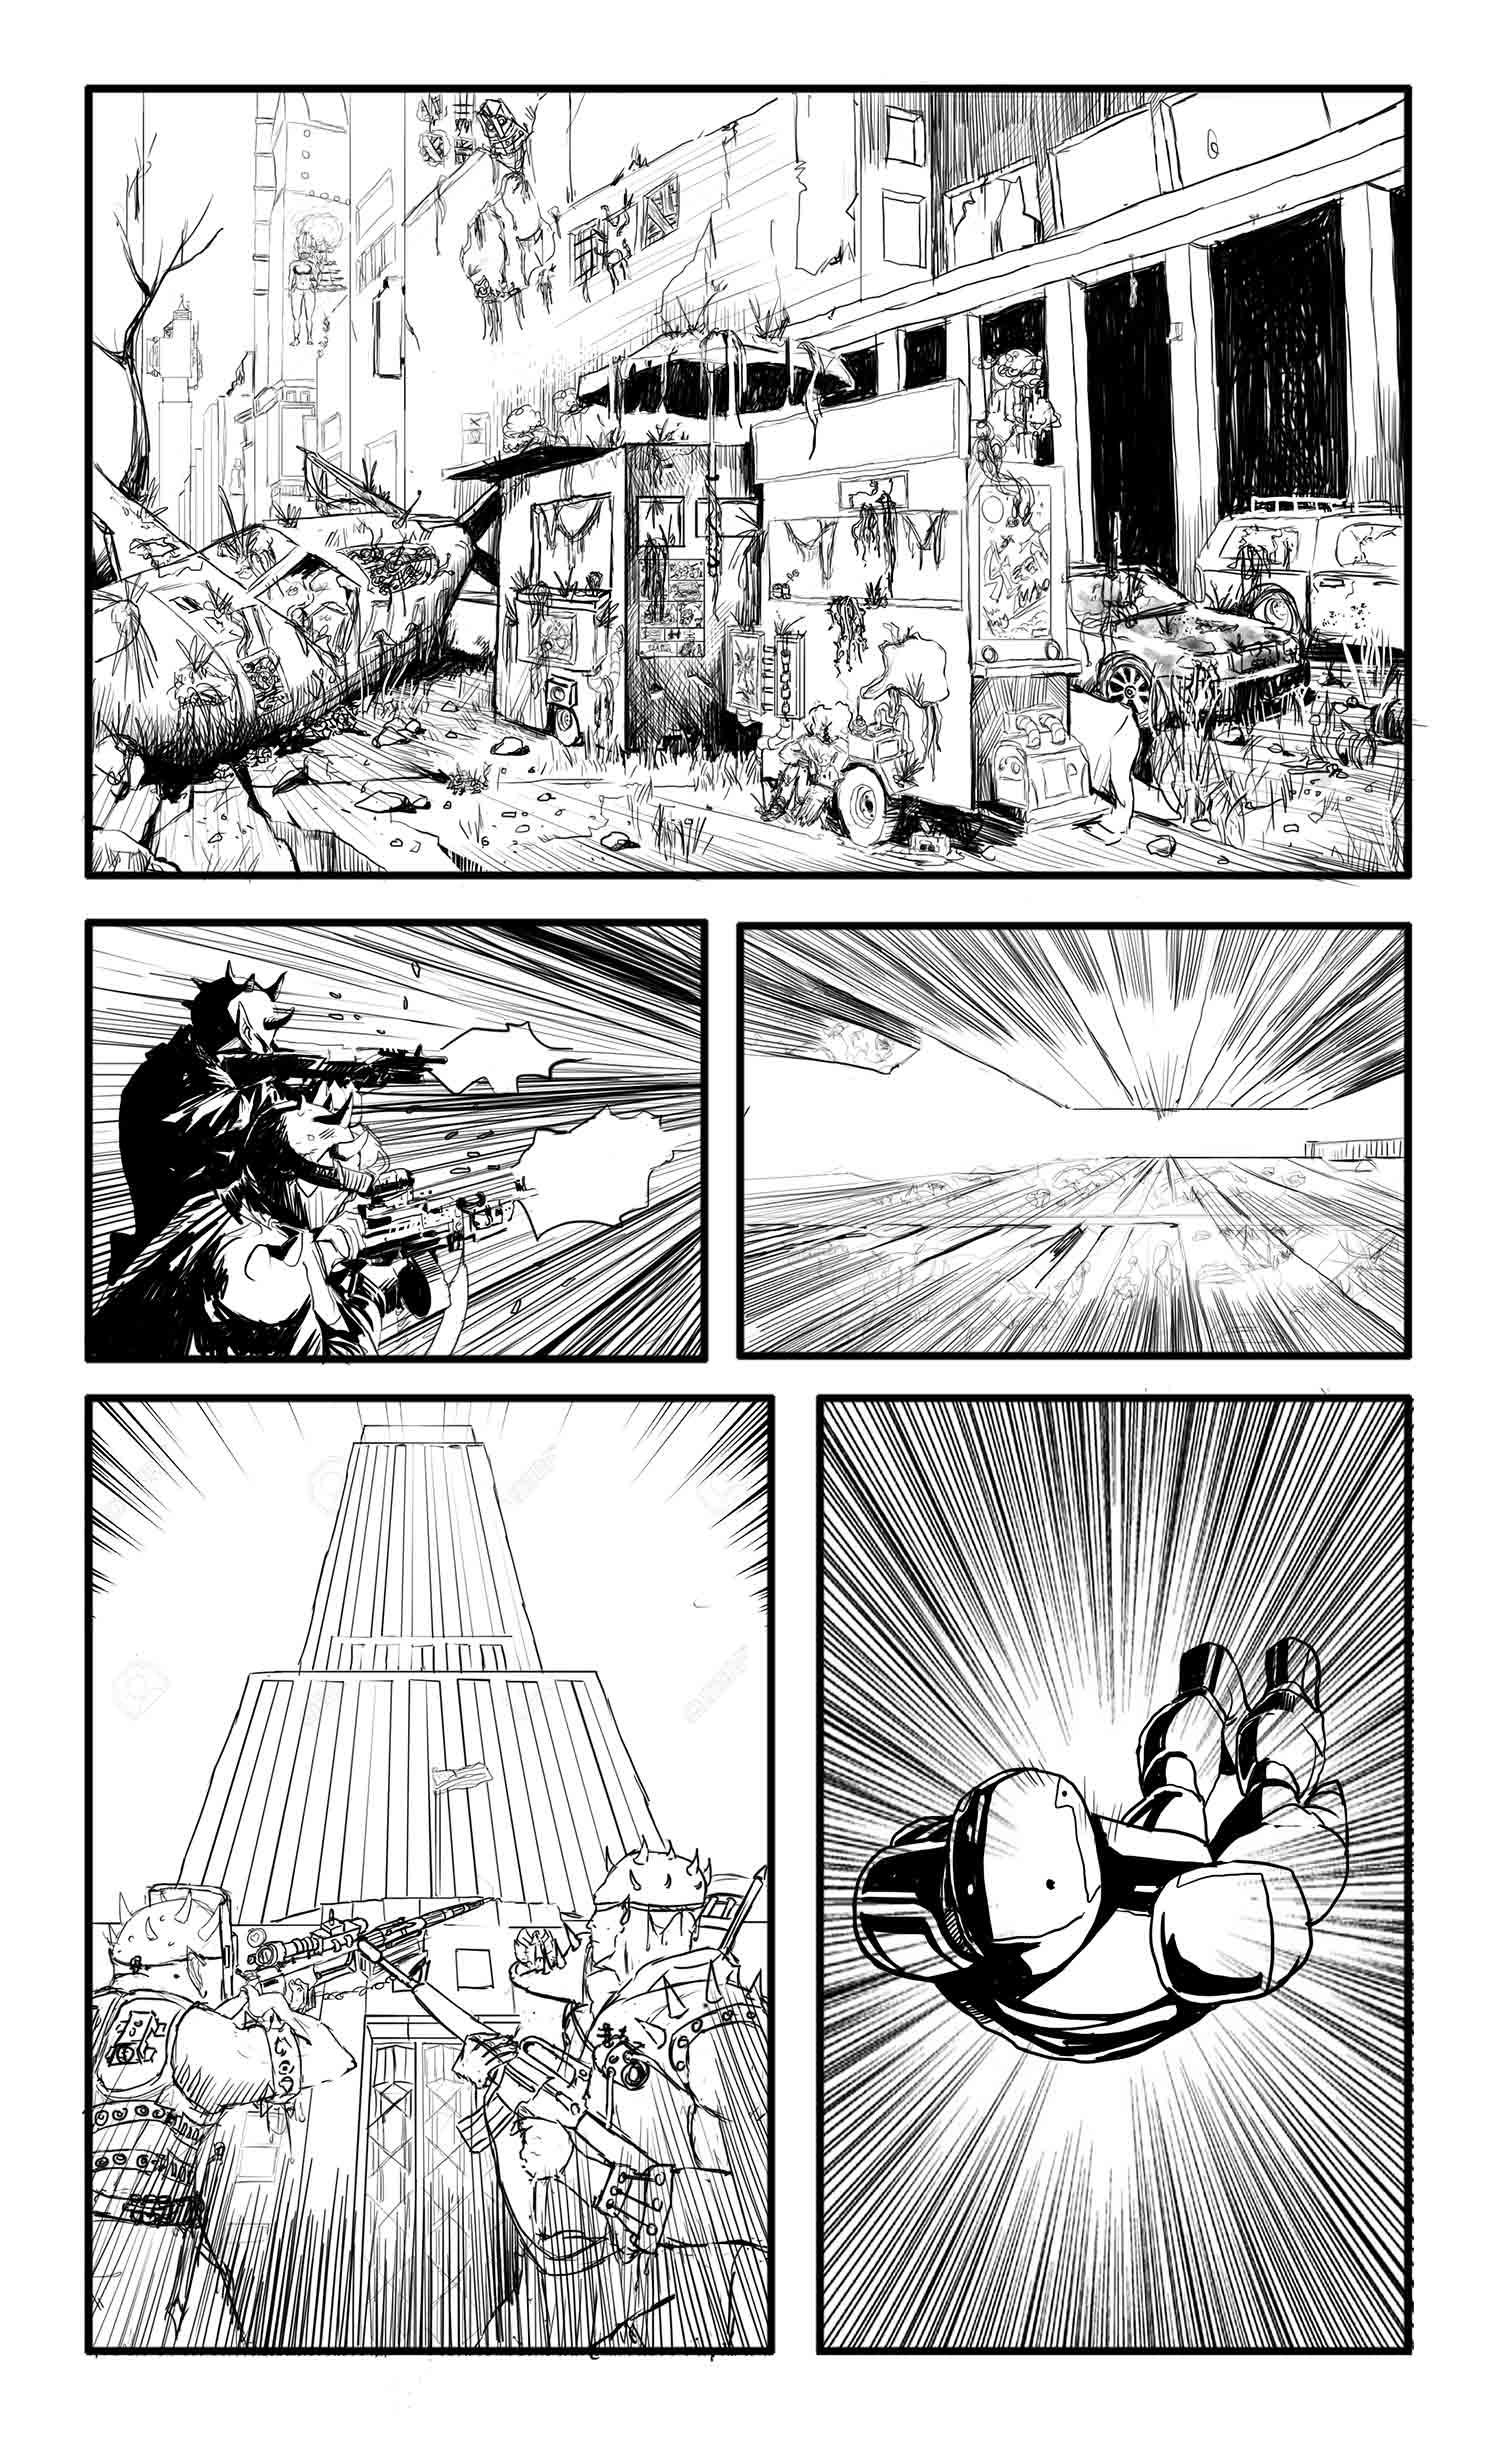 ashcan-digital-course-comic-portfolio-prep-works-17-v01-2018-08.jpg